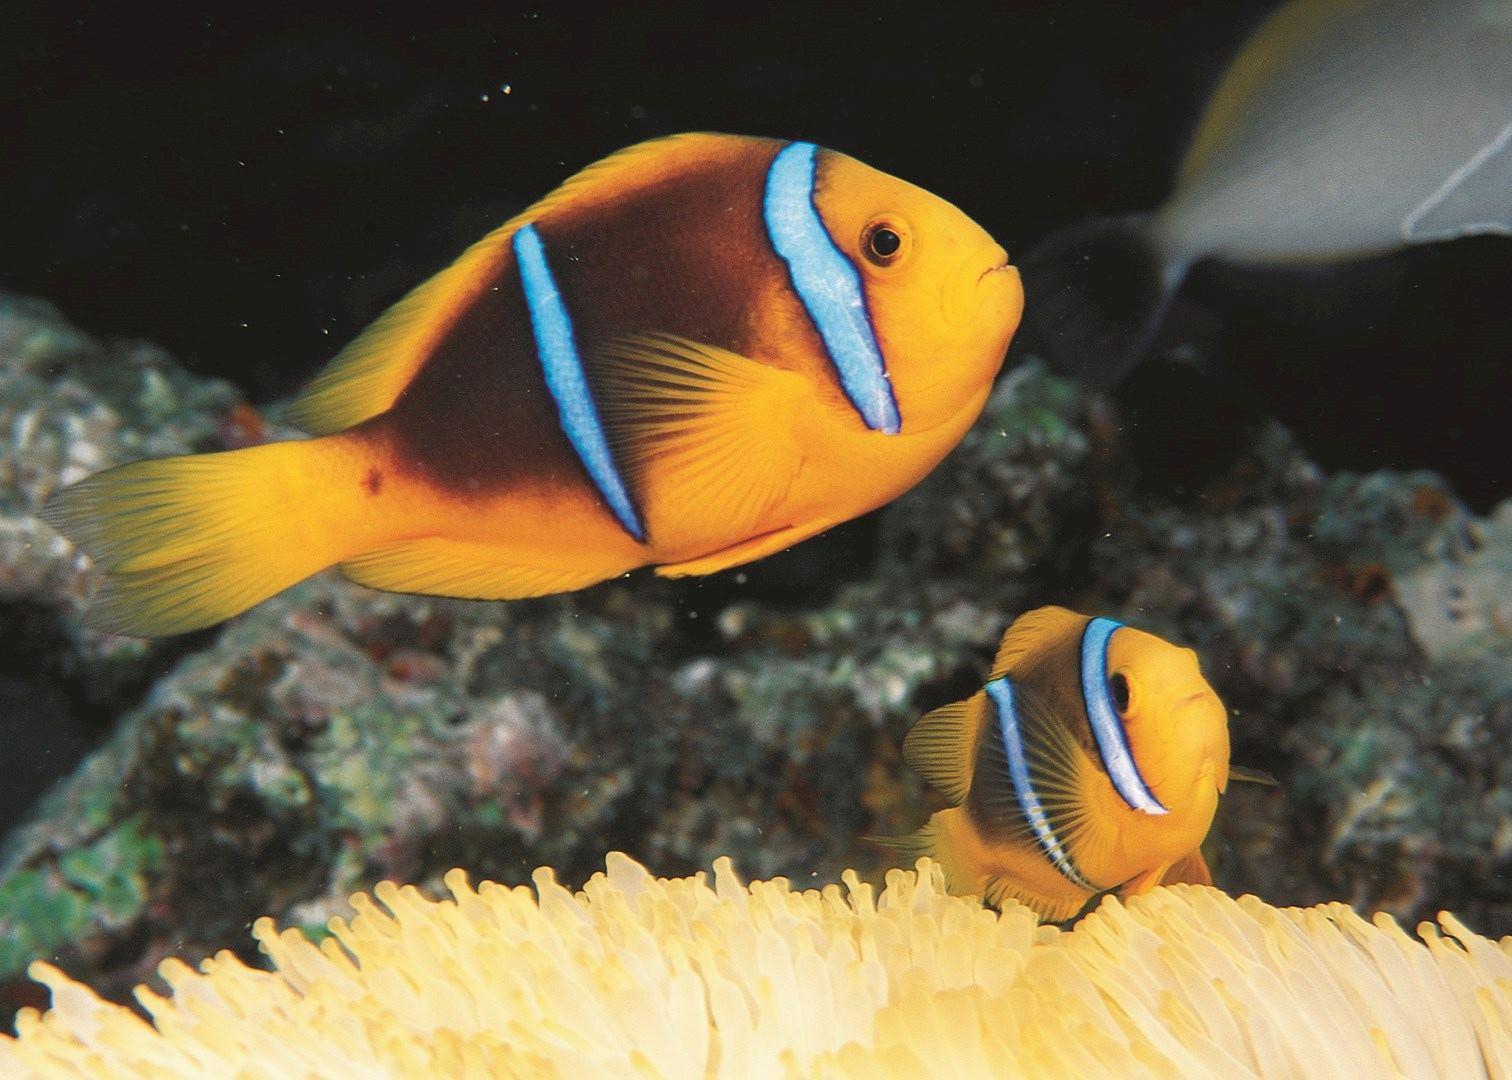 Bora bora vacations french polynesia audley travel for Bora bora fish